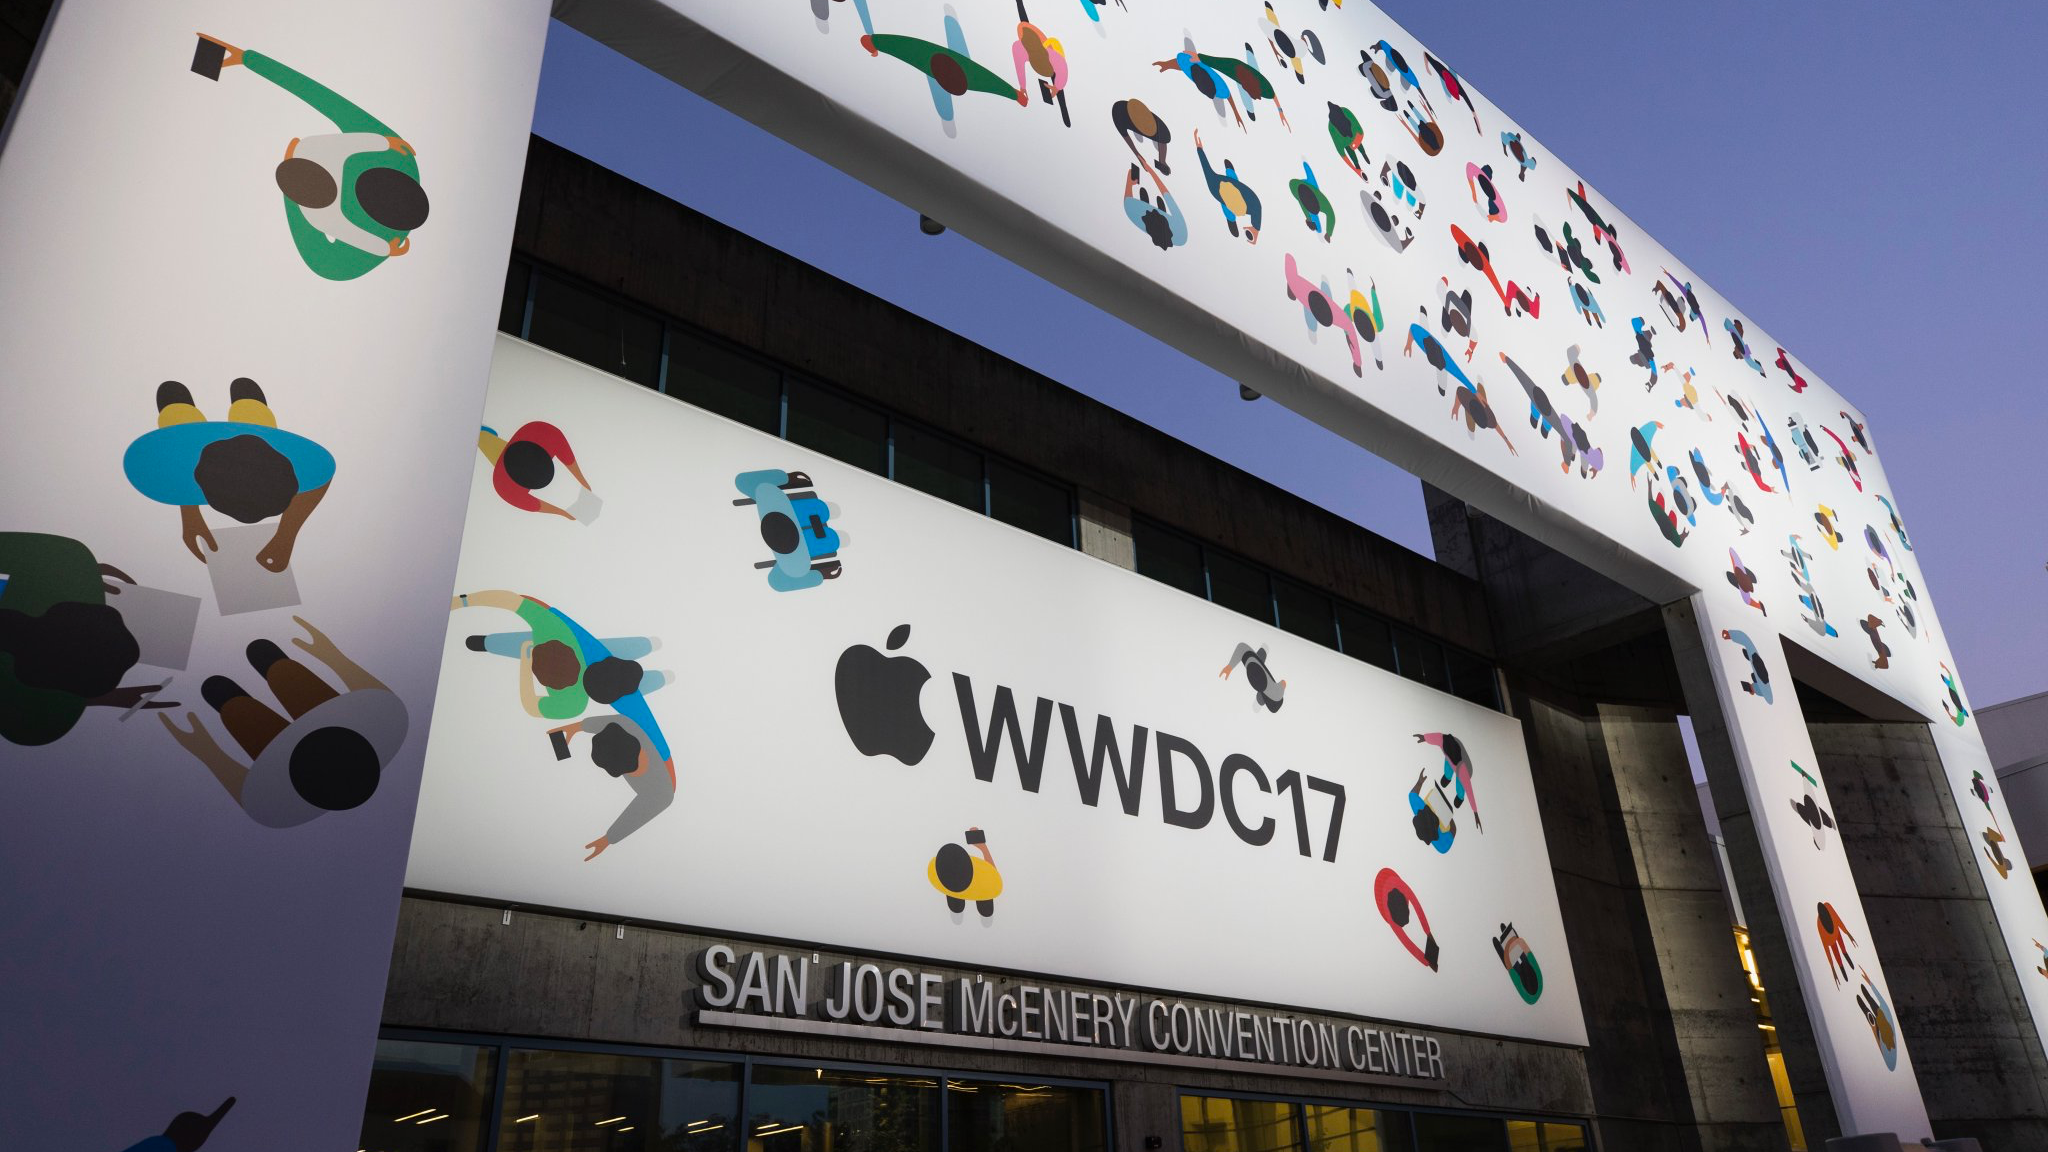 WWDC 2017 San Jose 16x9